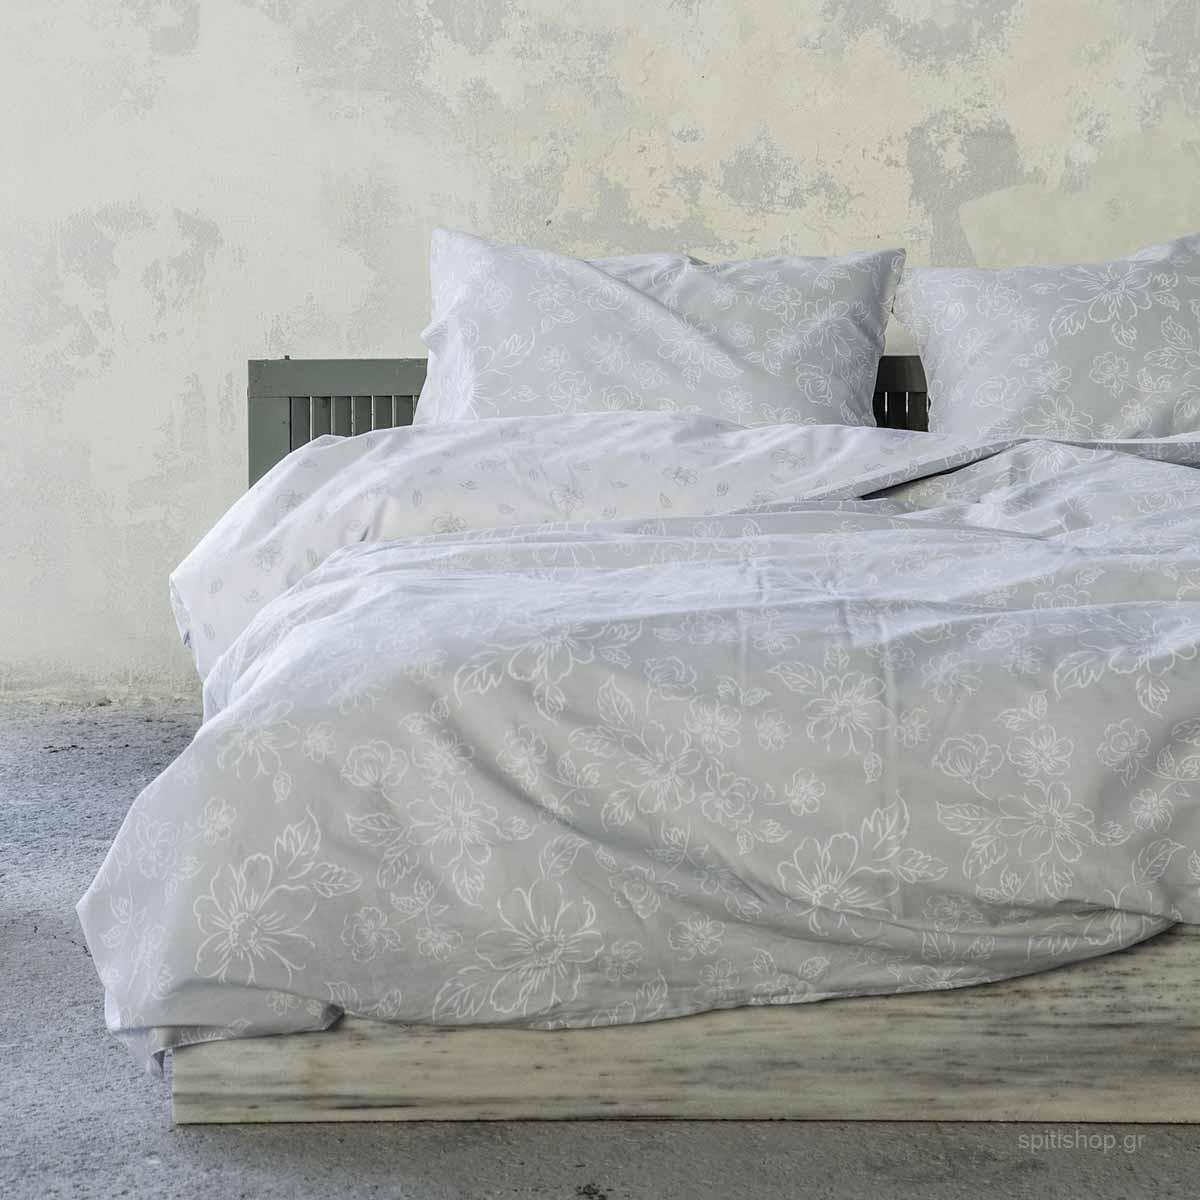 dc1d268993b -10% Spiti Shop Σεντόνια Μονά (Σετ) Nima Bed Linen Defile Grey ΧΩΡΙΣ  ΛΑΣΤΙΧΟ ΧΩΡΙΣ ΛΑΣΤΙΧΟ